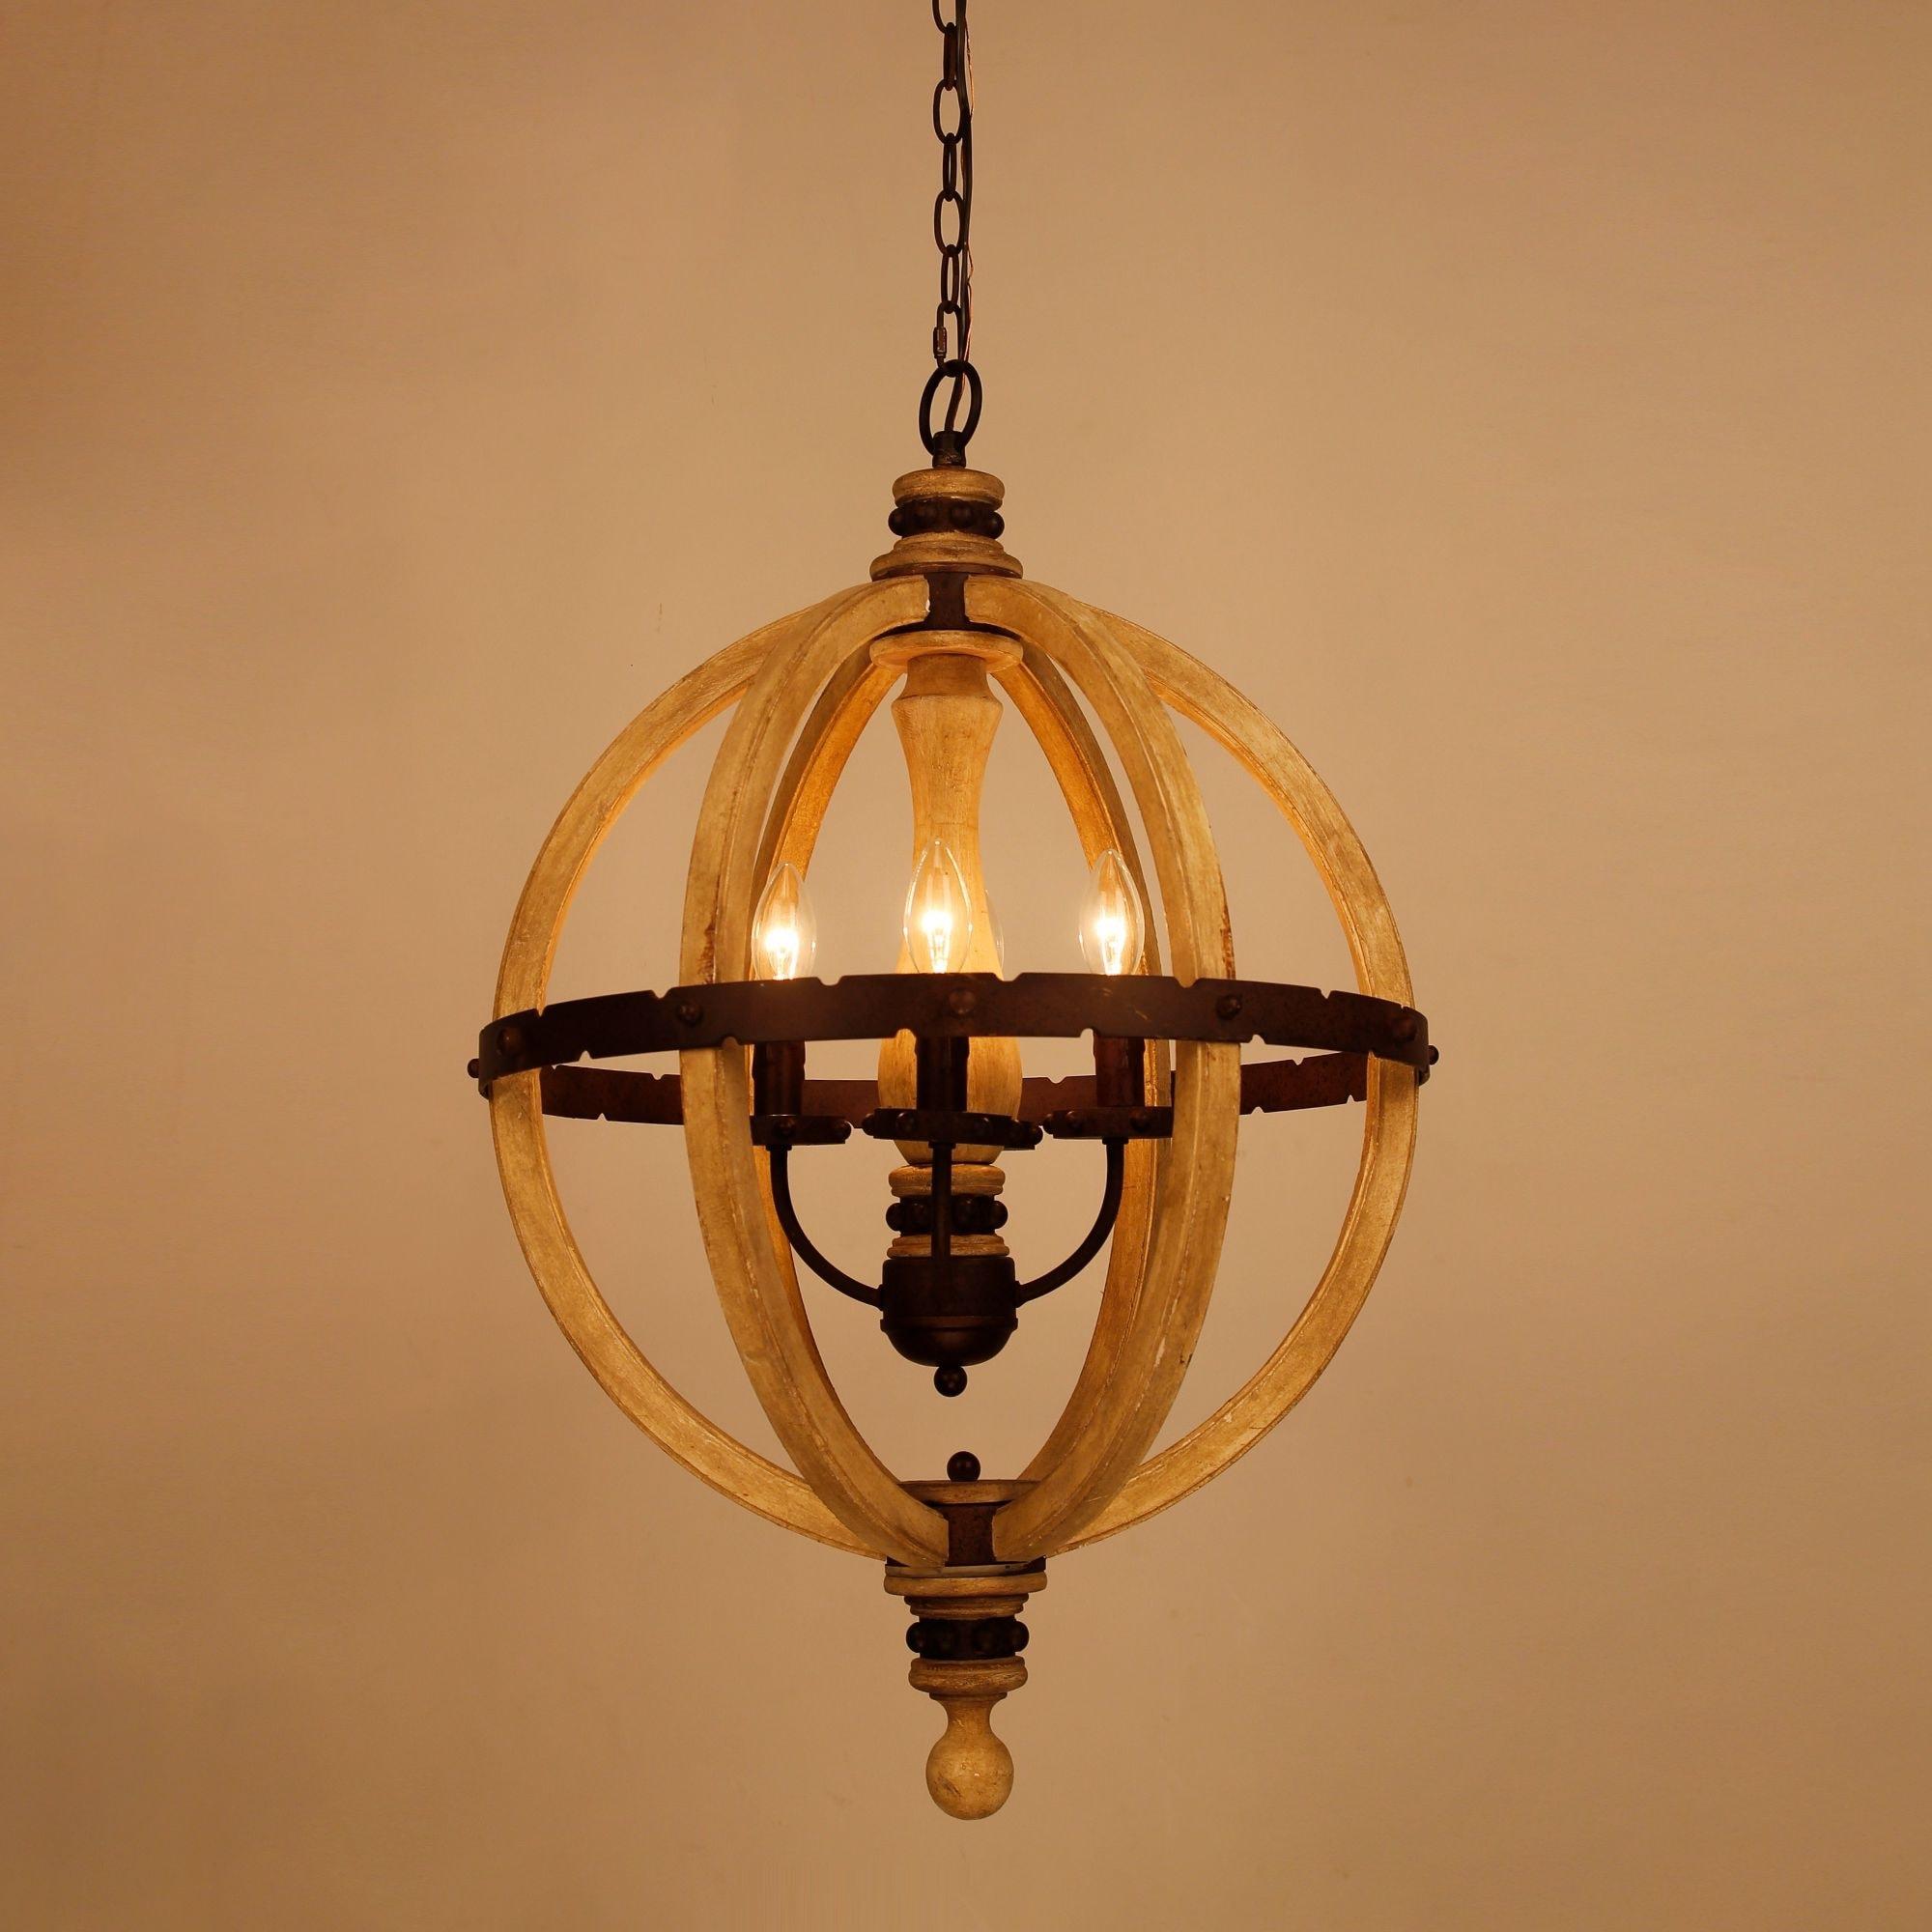 Shop Farmhouse 20-inch 4-Light Distressed Wood Orb Chandelier - Free ...